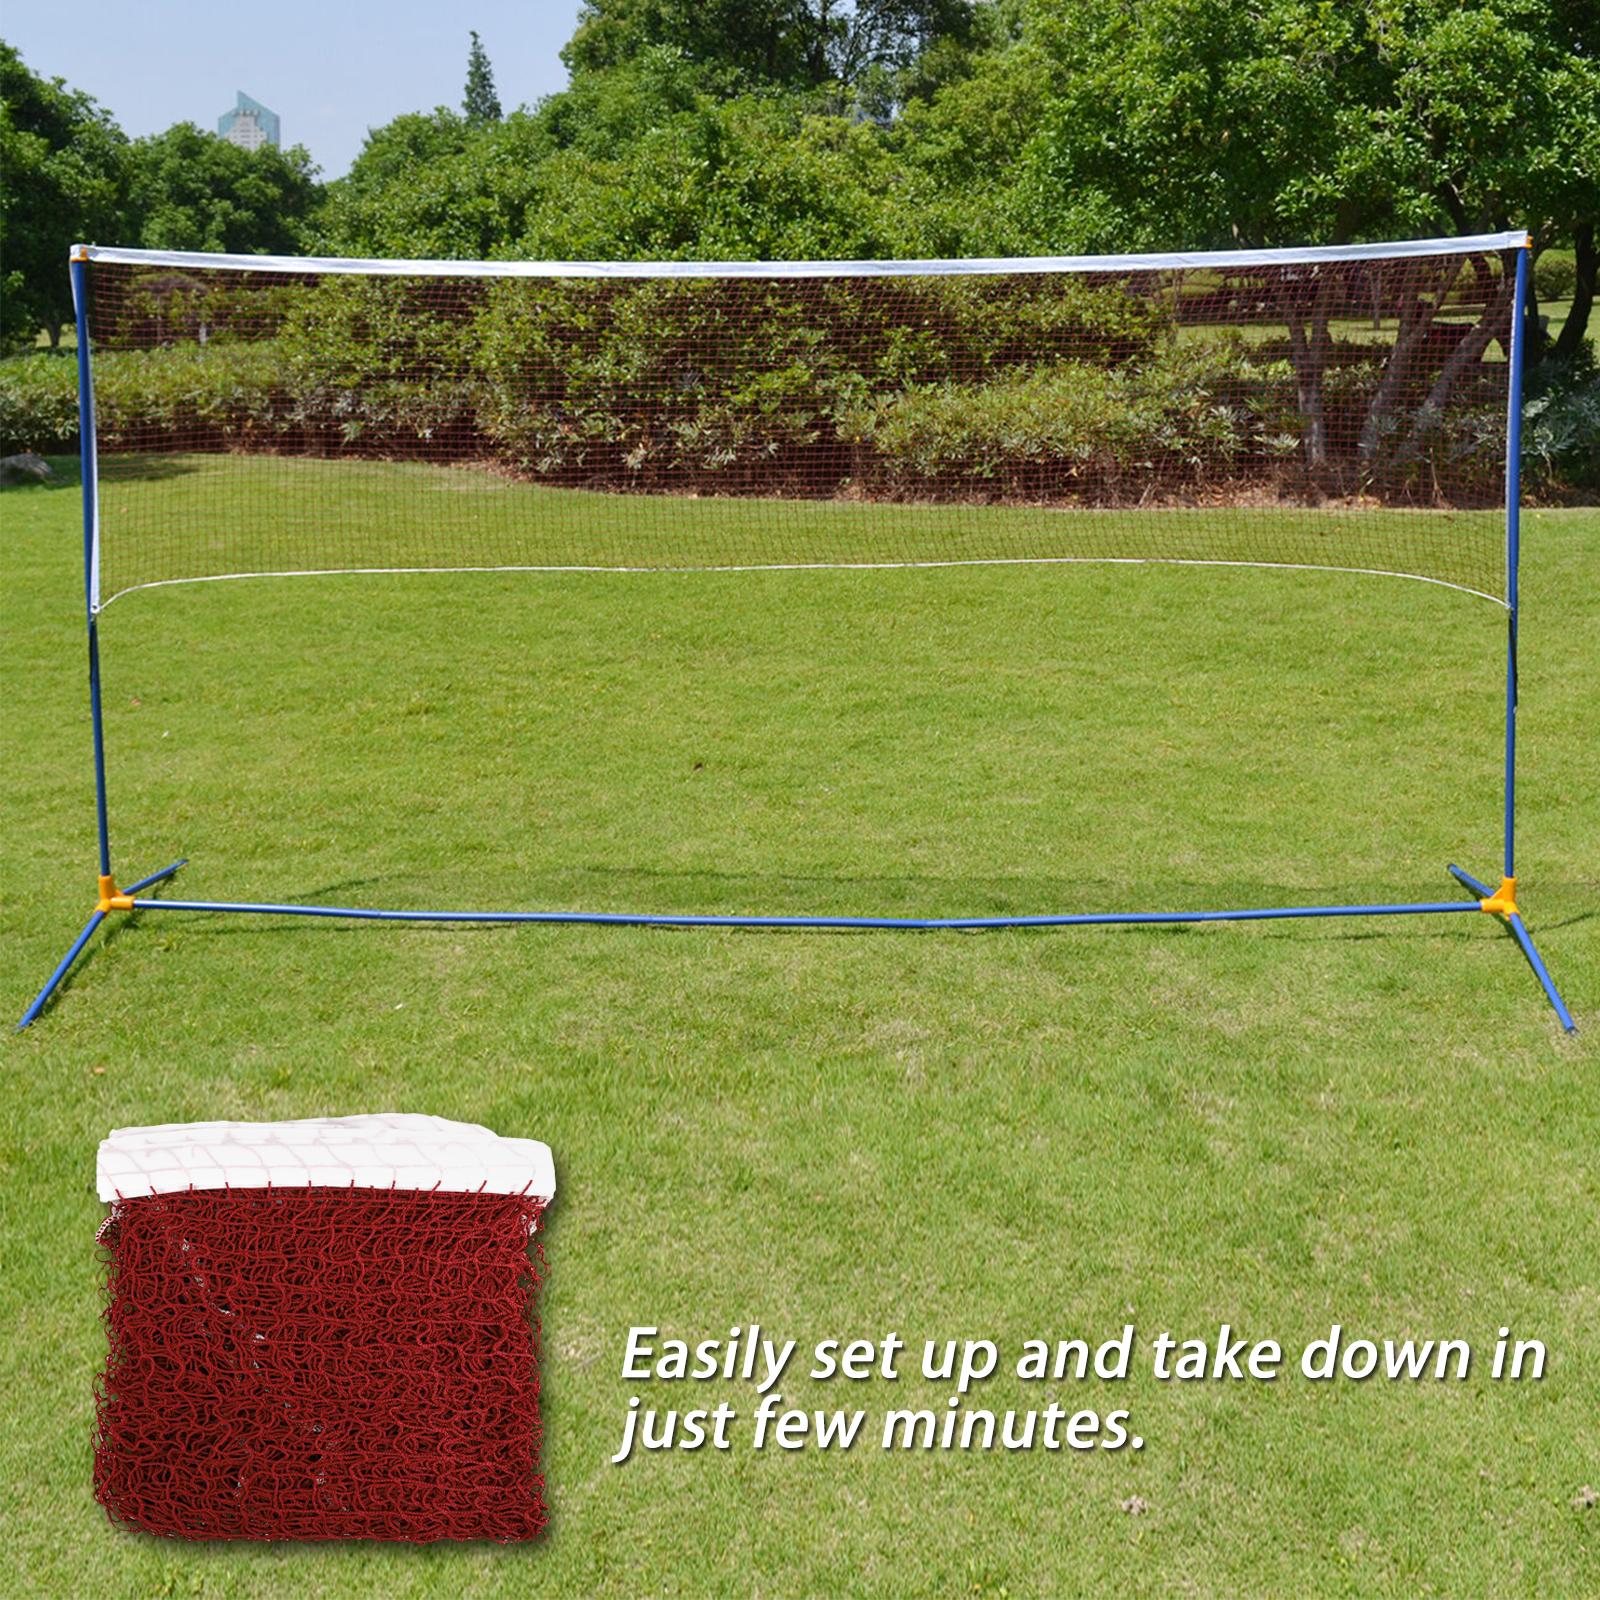 Red-Badminton-Tennis-Volleyball-Net-For-Beach-Garden-Indoor-Outdoor-Games-Sport thumbnail 7